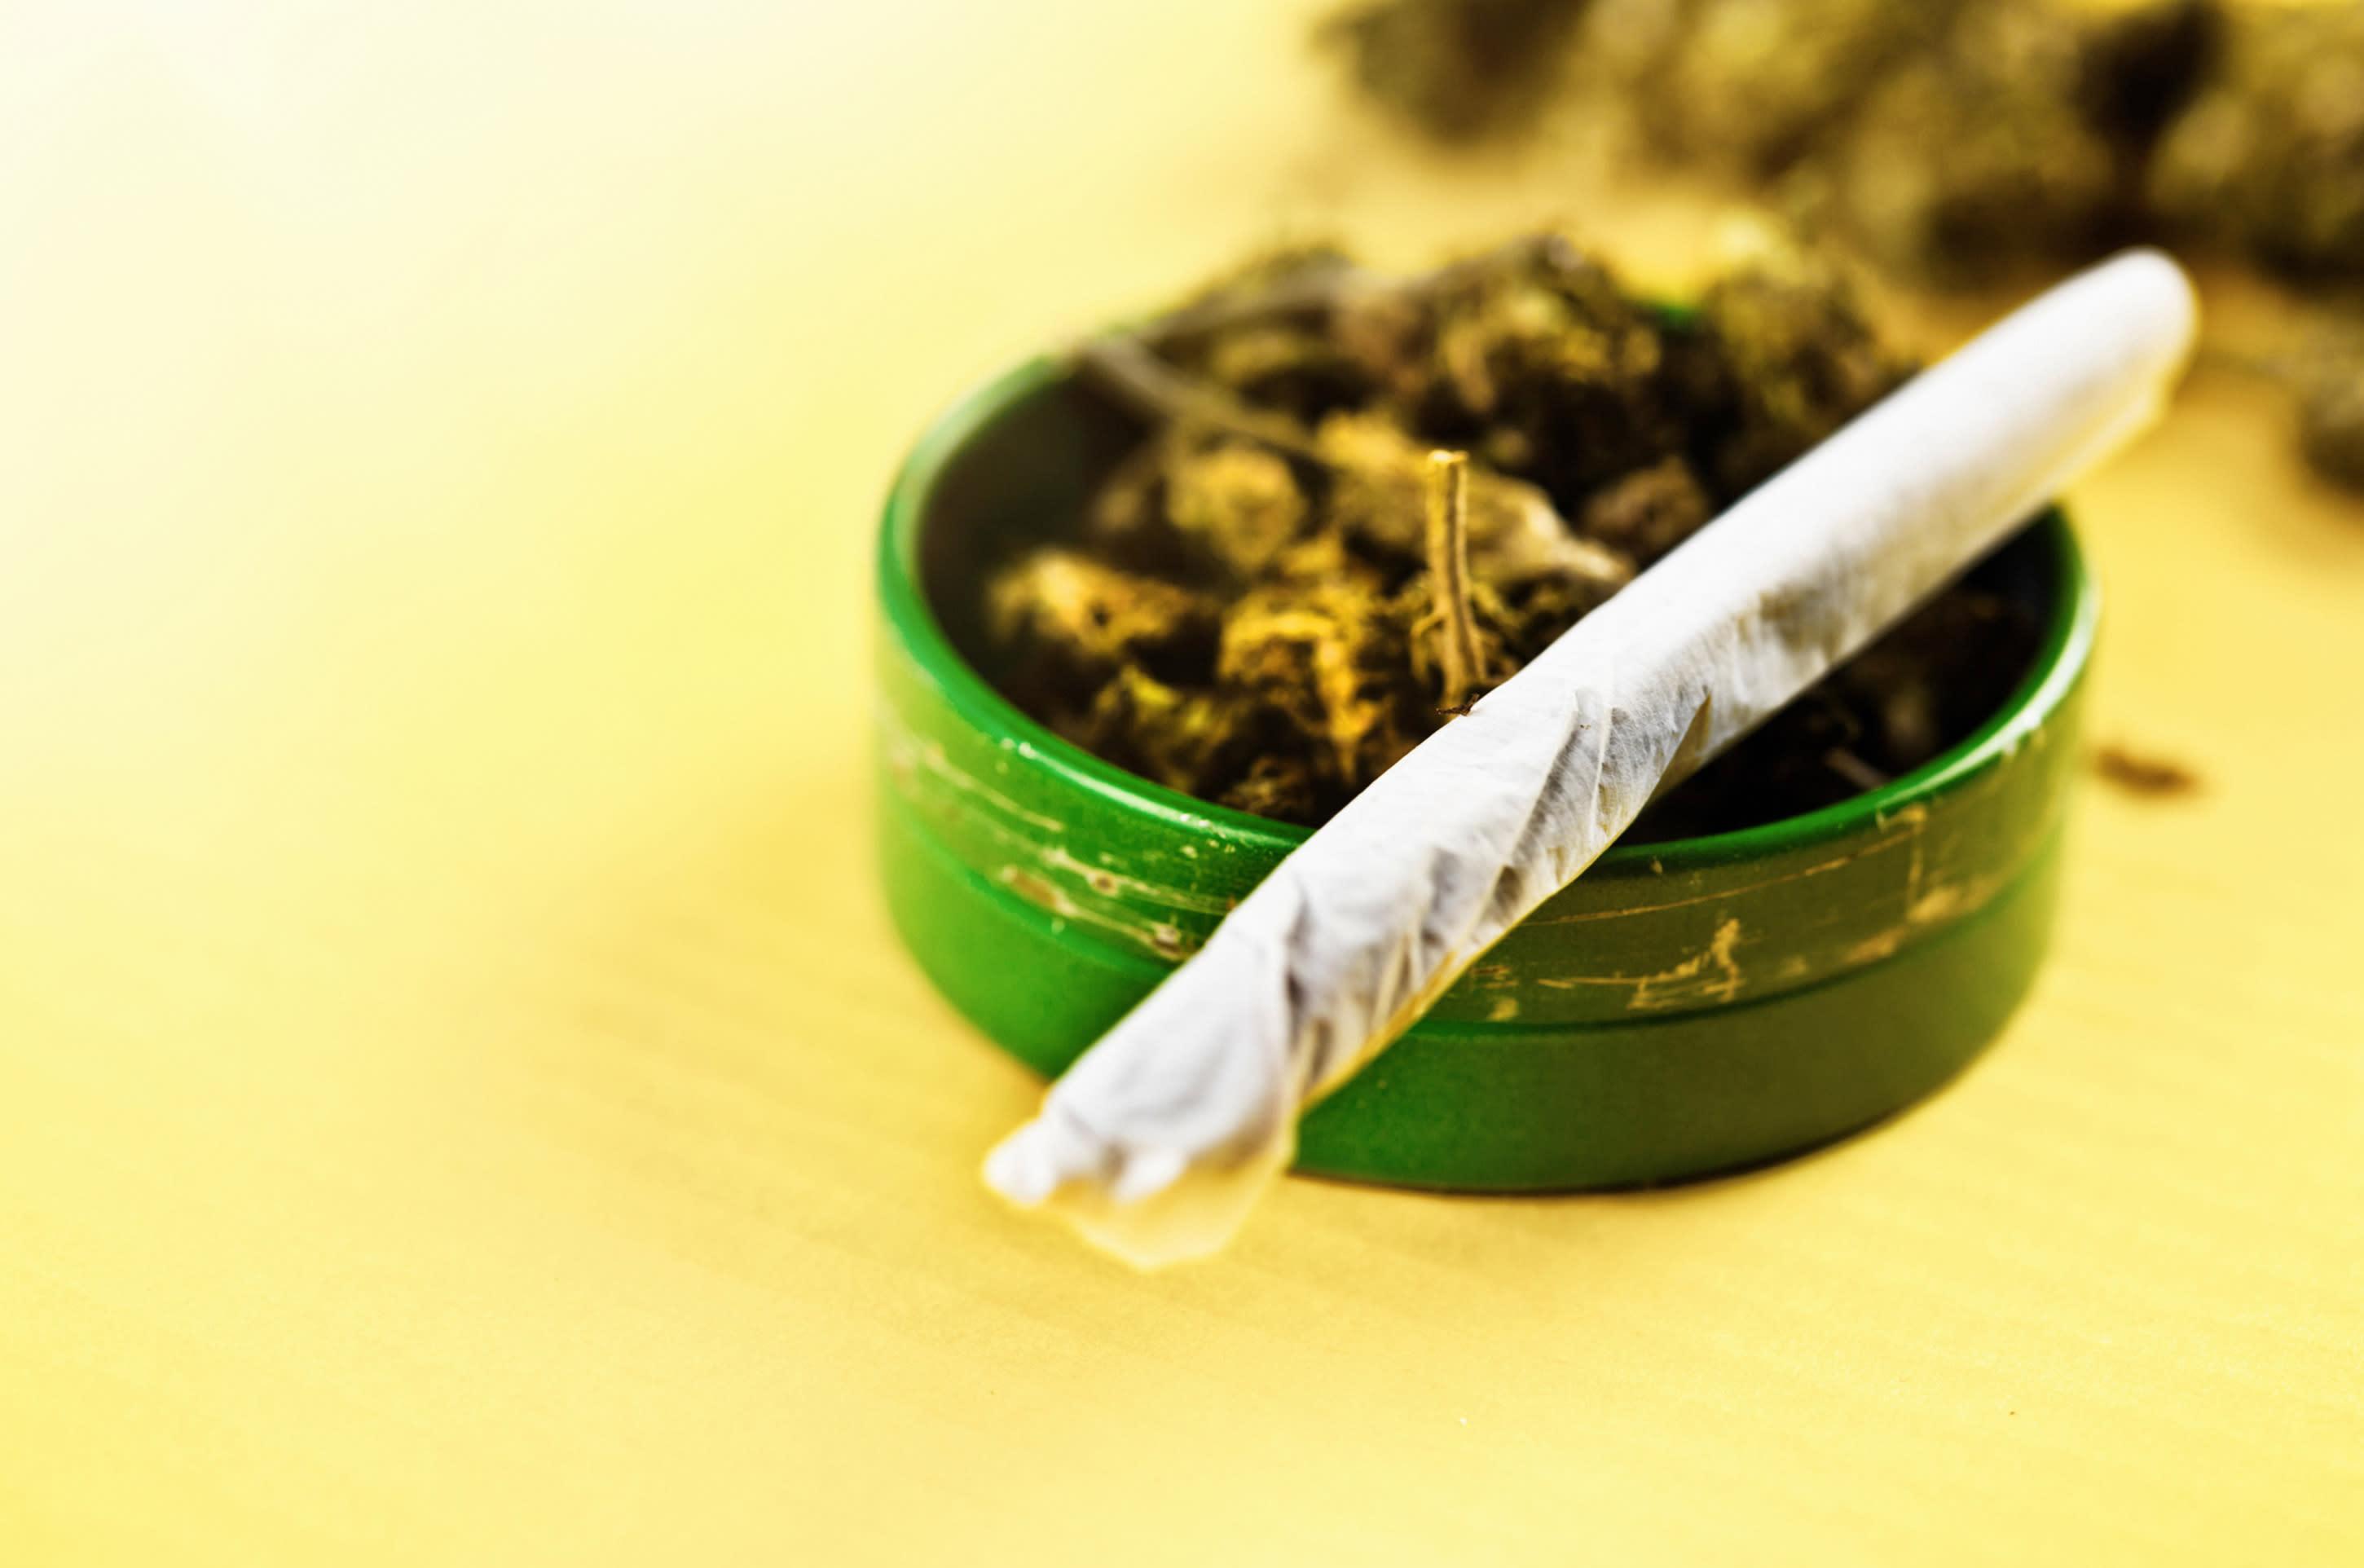 Massachusetts to start selling recreational marijuana